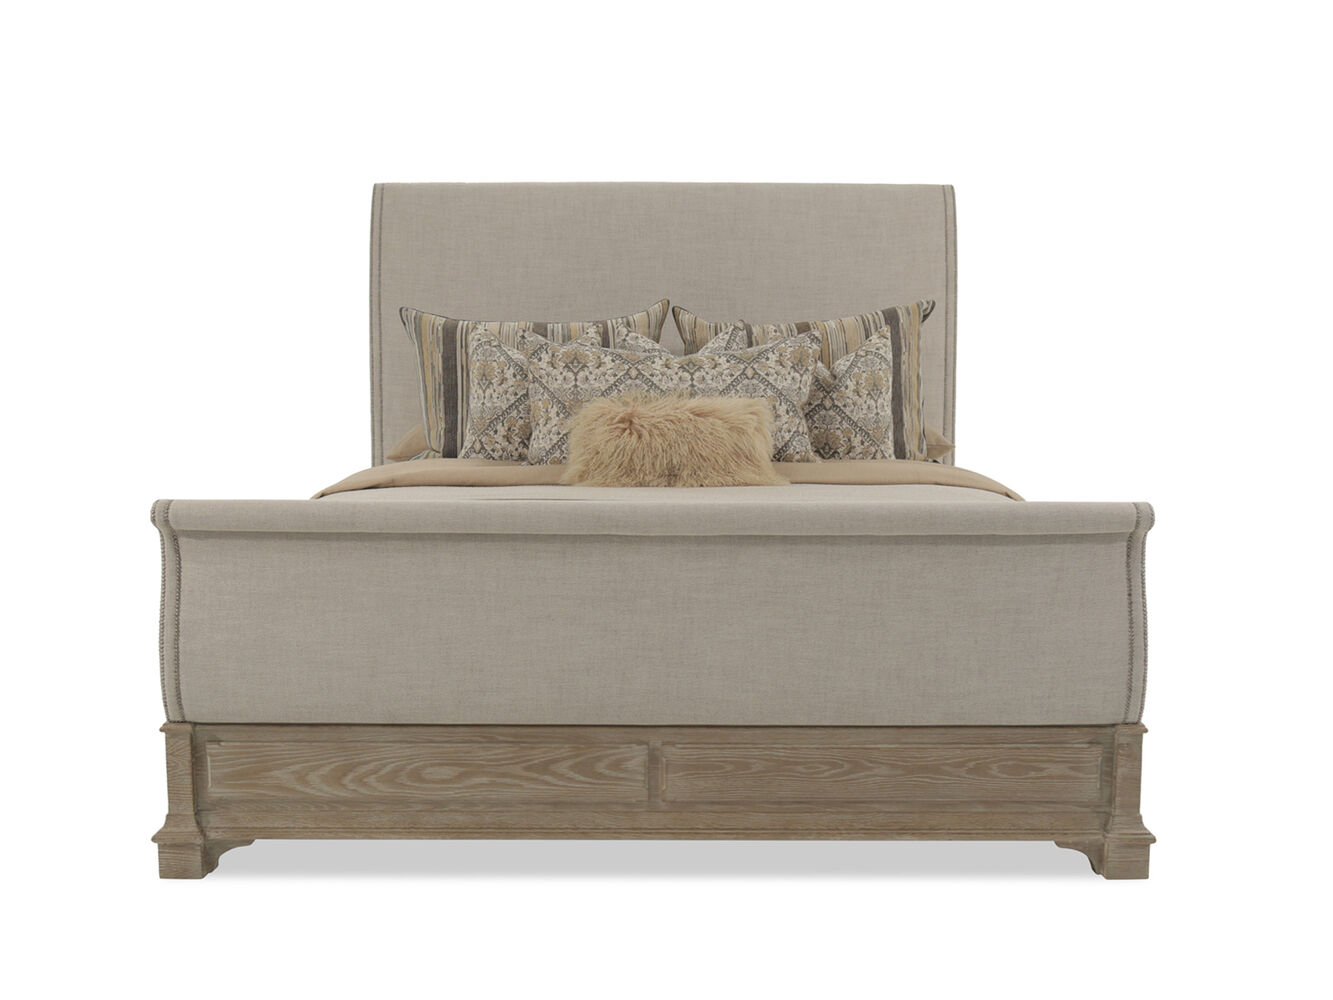 Bernhardt Antiquarian Wheat Sleigh Bed